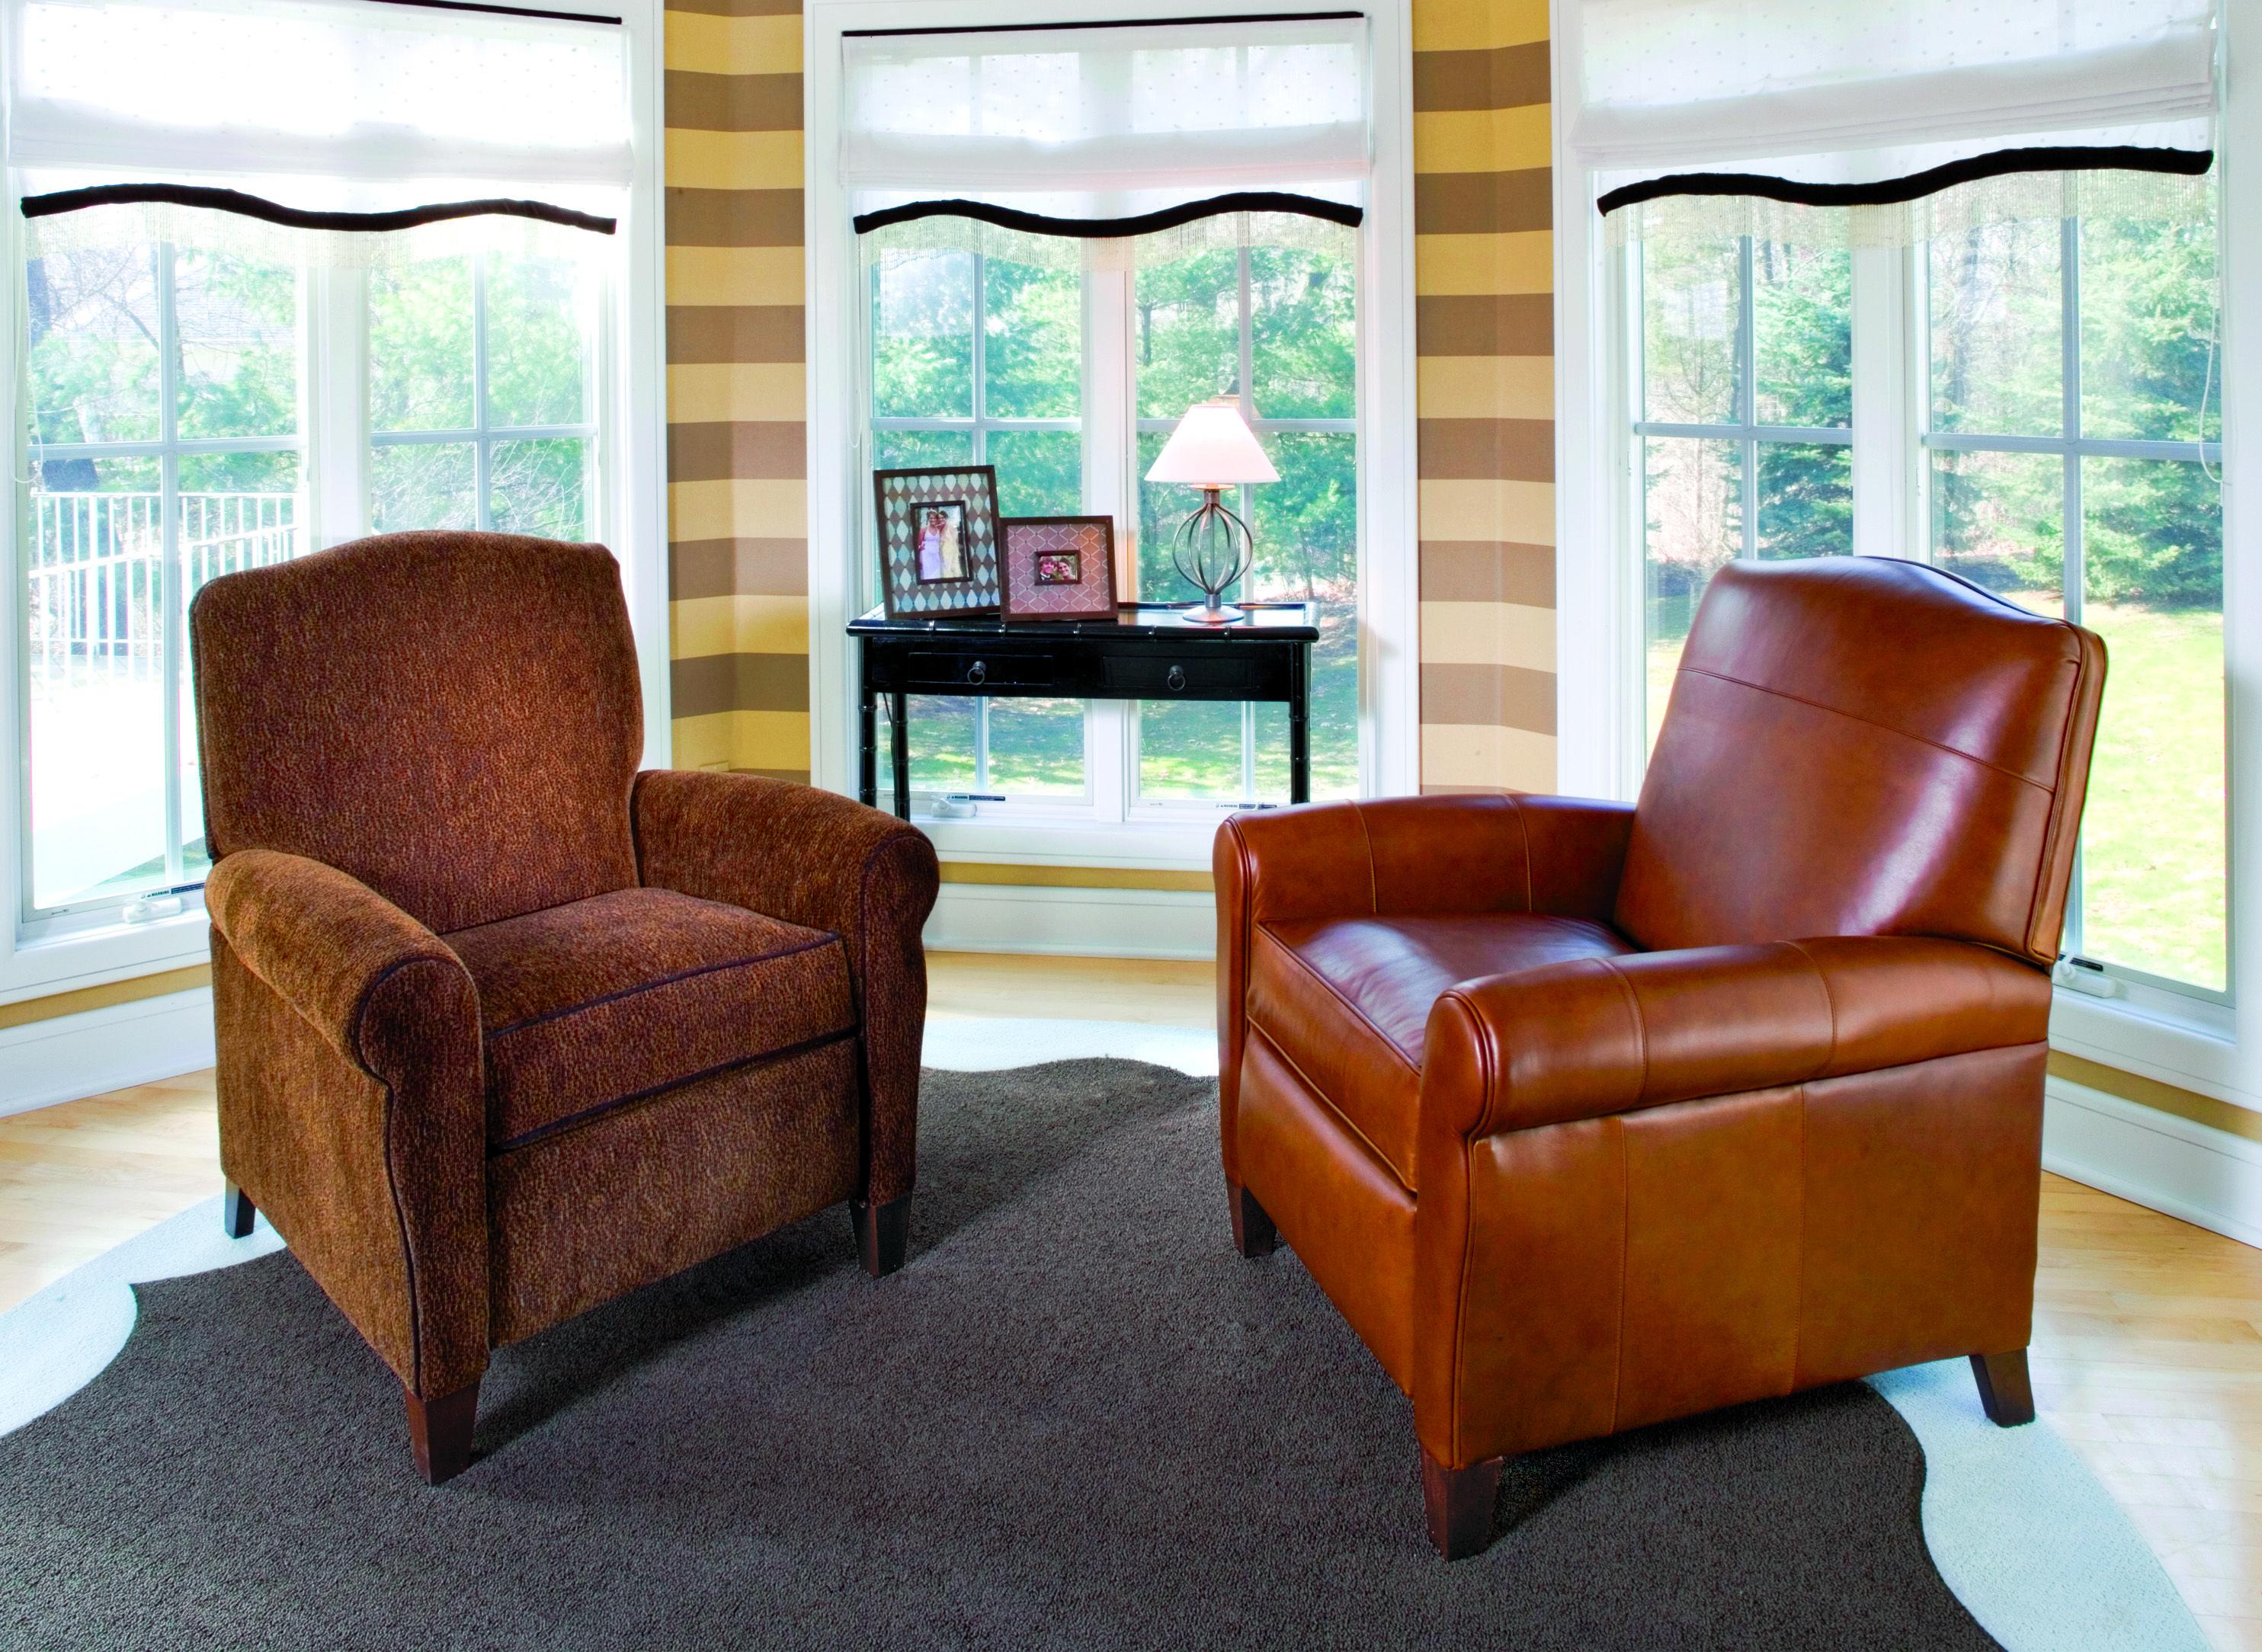 Smith Brothers Living Room Pressback Reclining Chair At Schmitt Furniture  Company At Schmitt Furniture Company In New Albany, IN